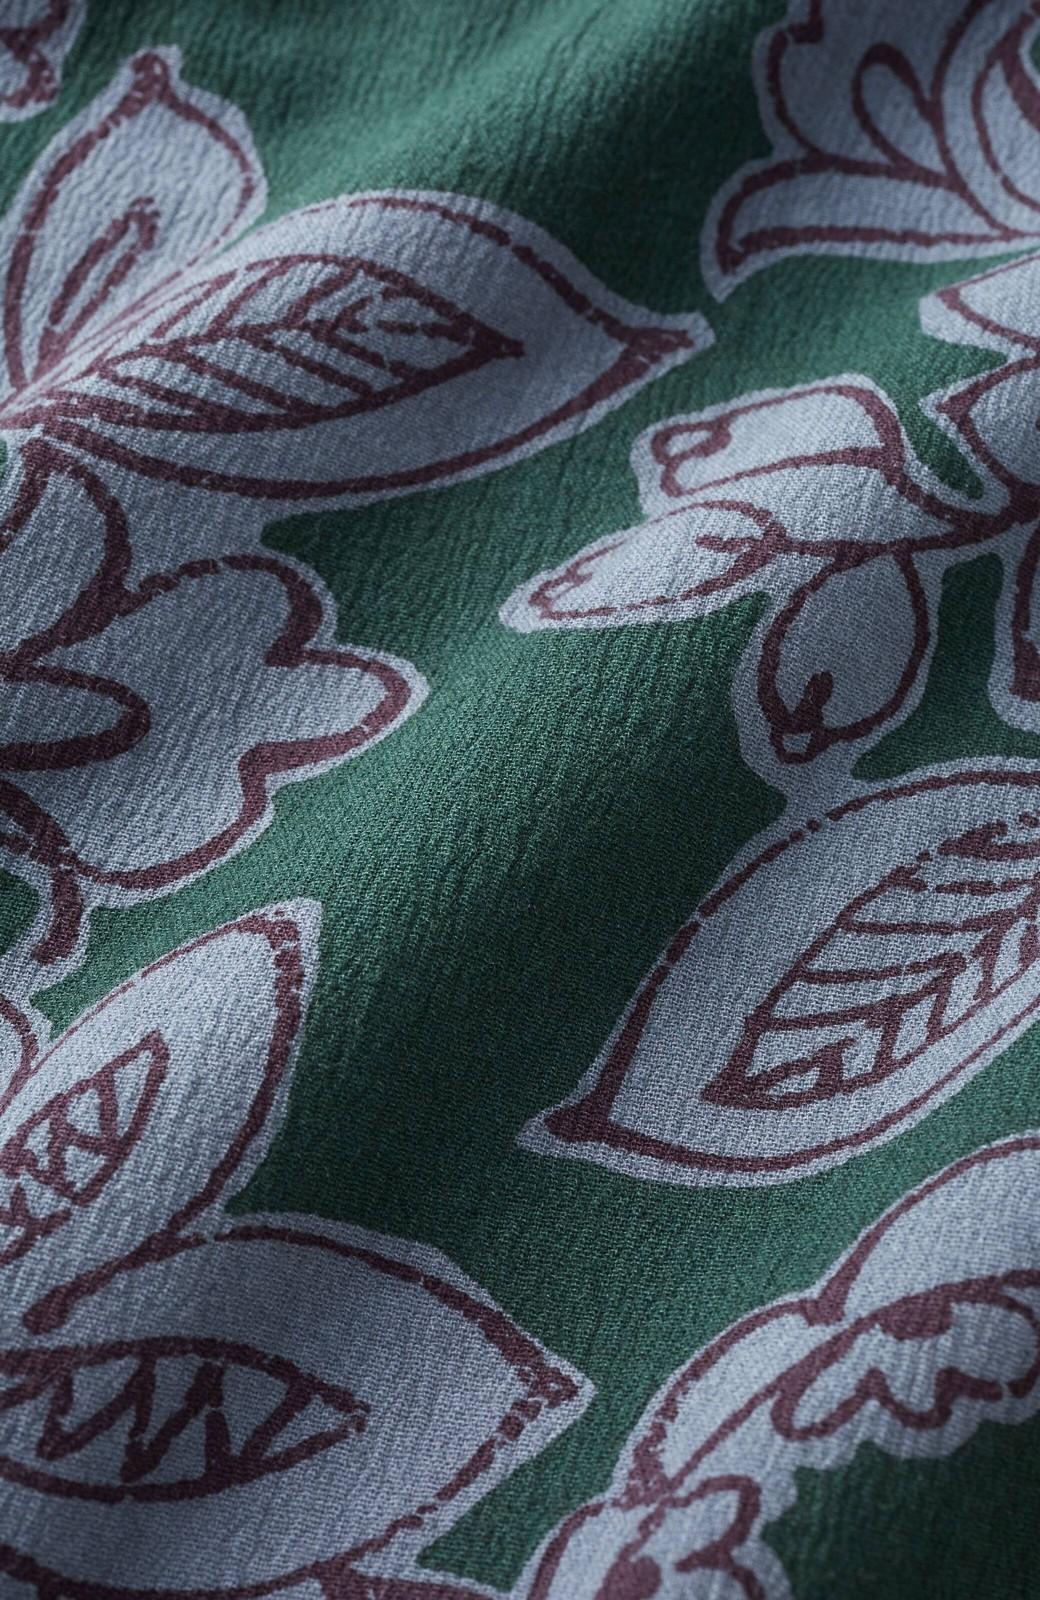 haco! 京都の浴衣屋さんと作った浴衣生地のセミタイトスカート <グリーン系その他>の商品写真4